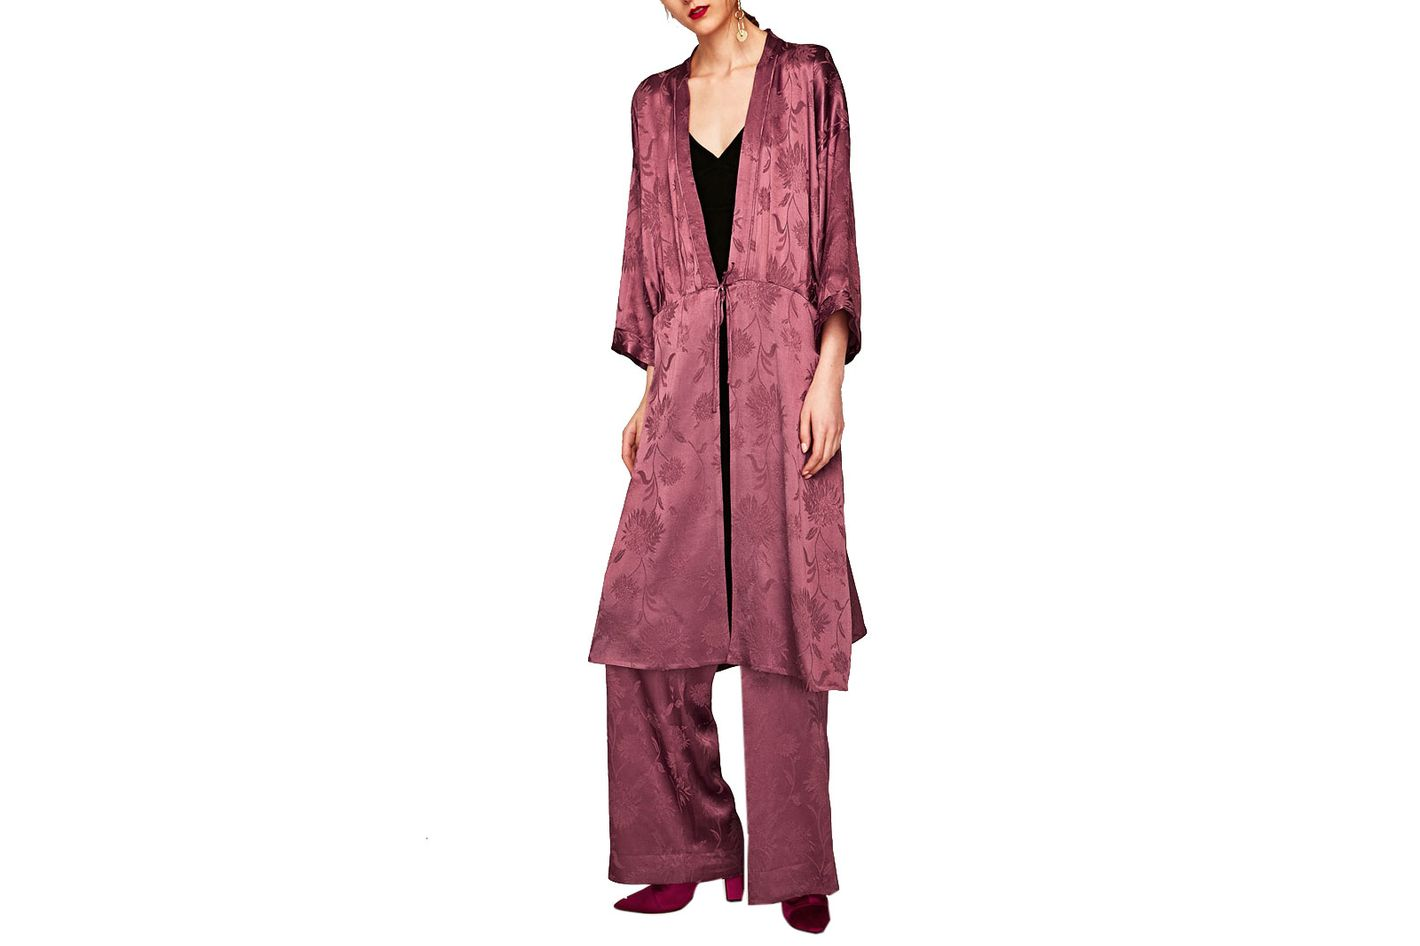 Shimmery Jacquard Robe